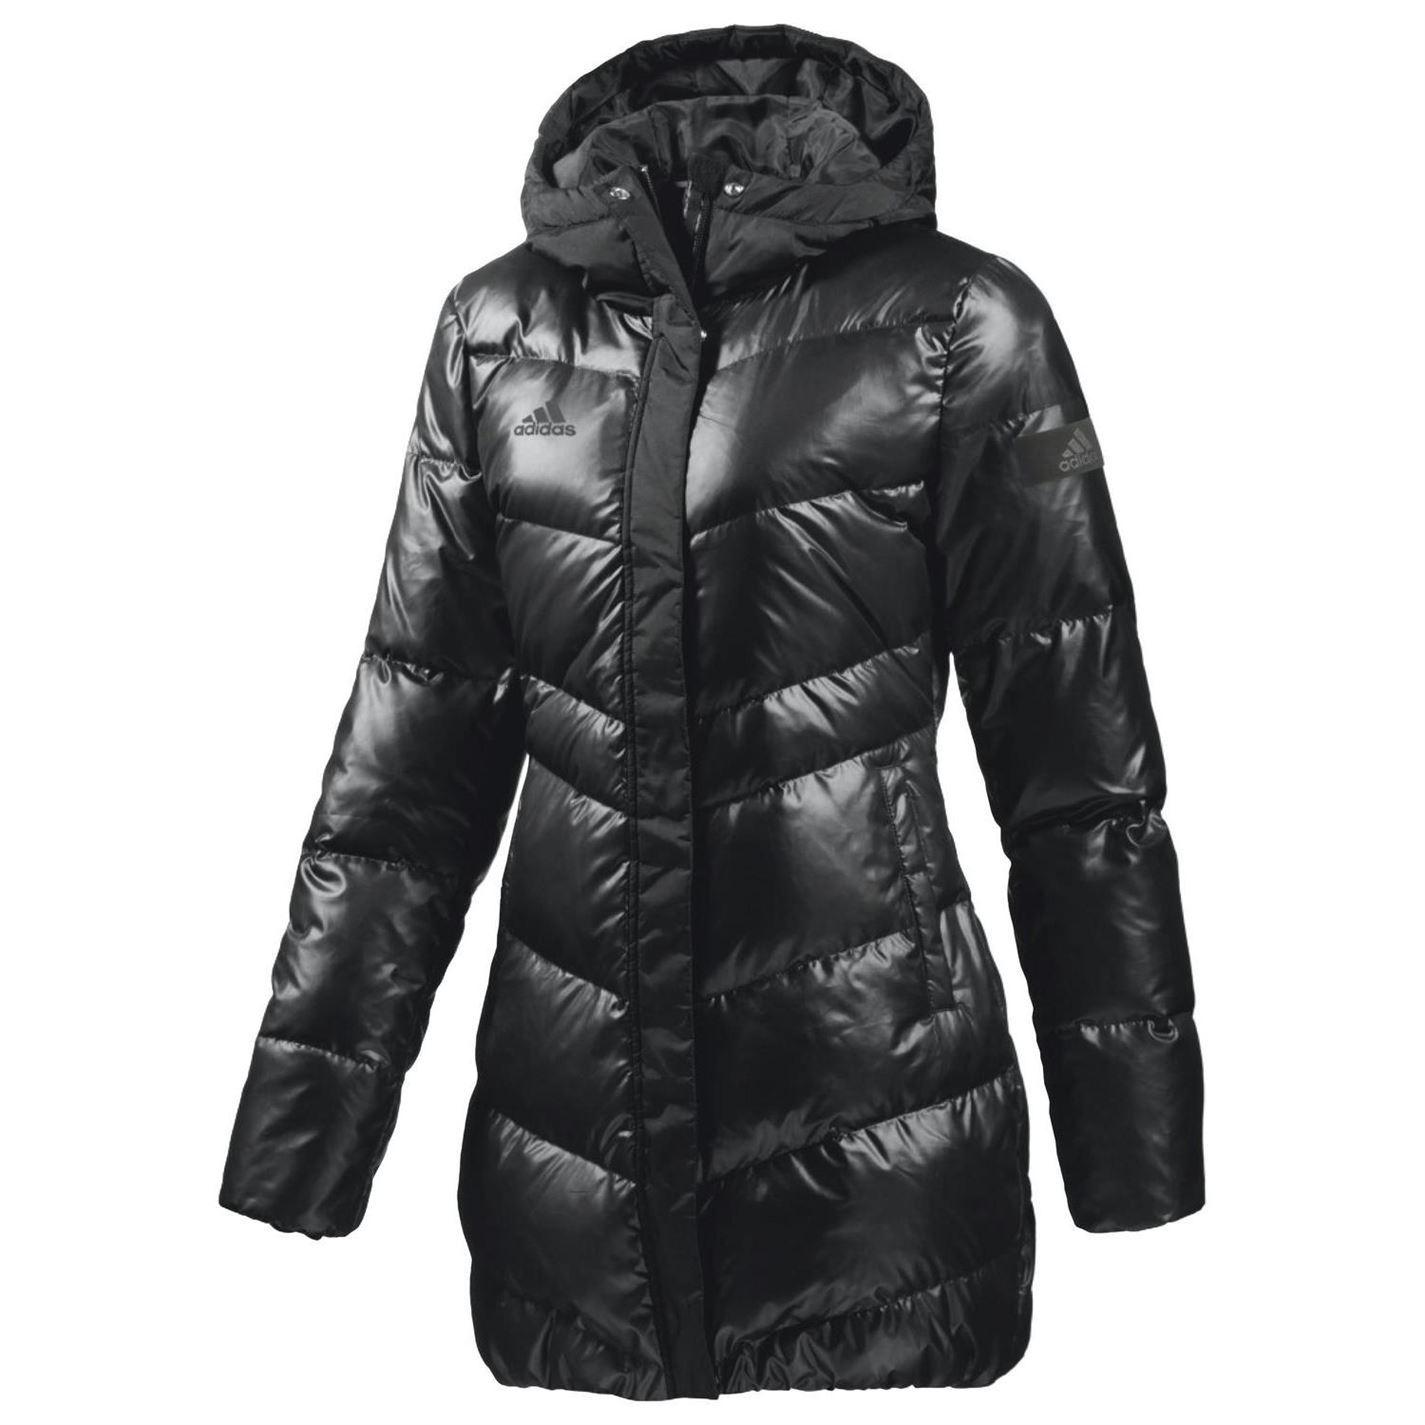 adidas womens ladies frost down jacket warm winter. Black Bedroom Furniture Sets. Home Design Ideas